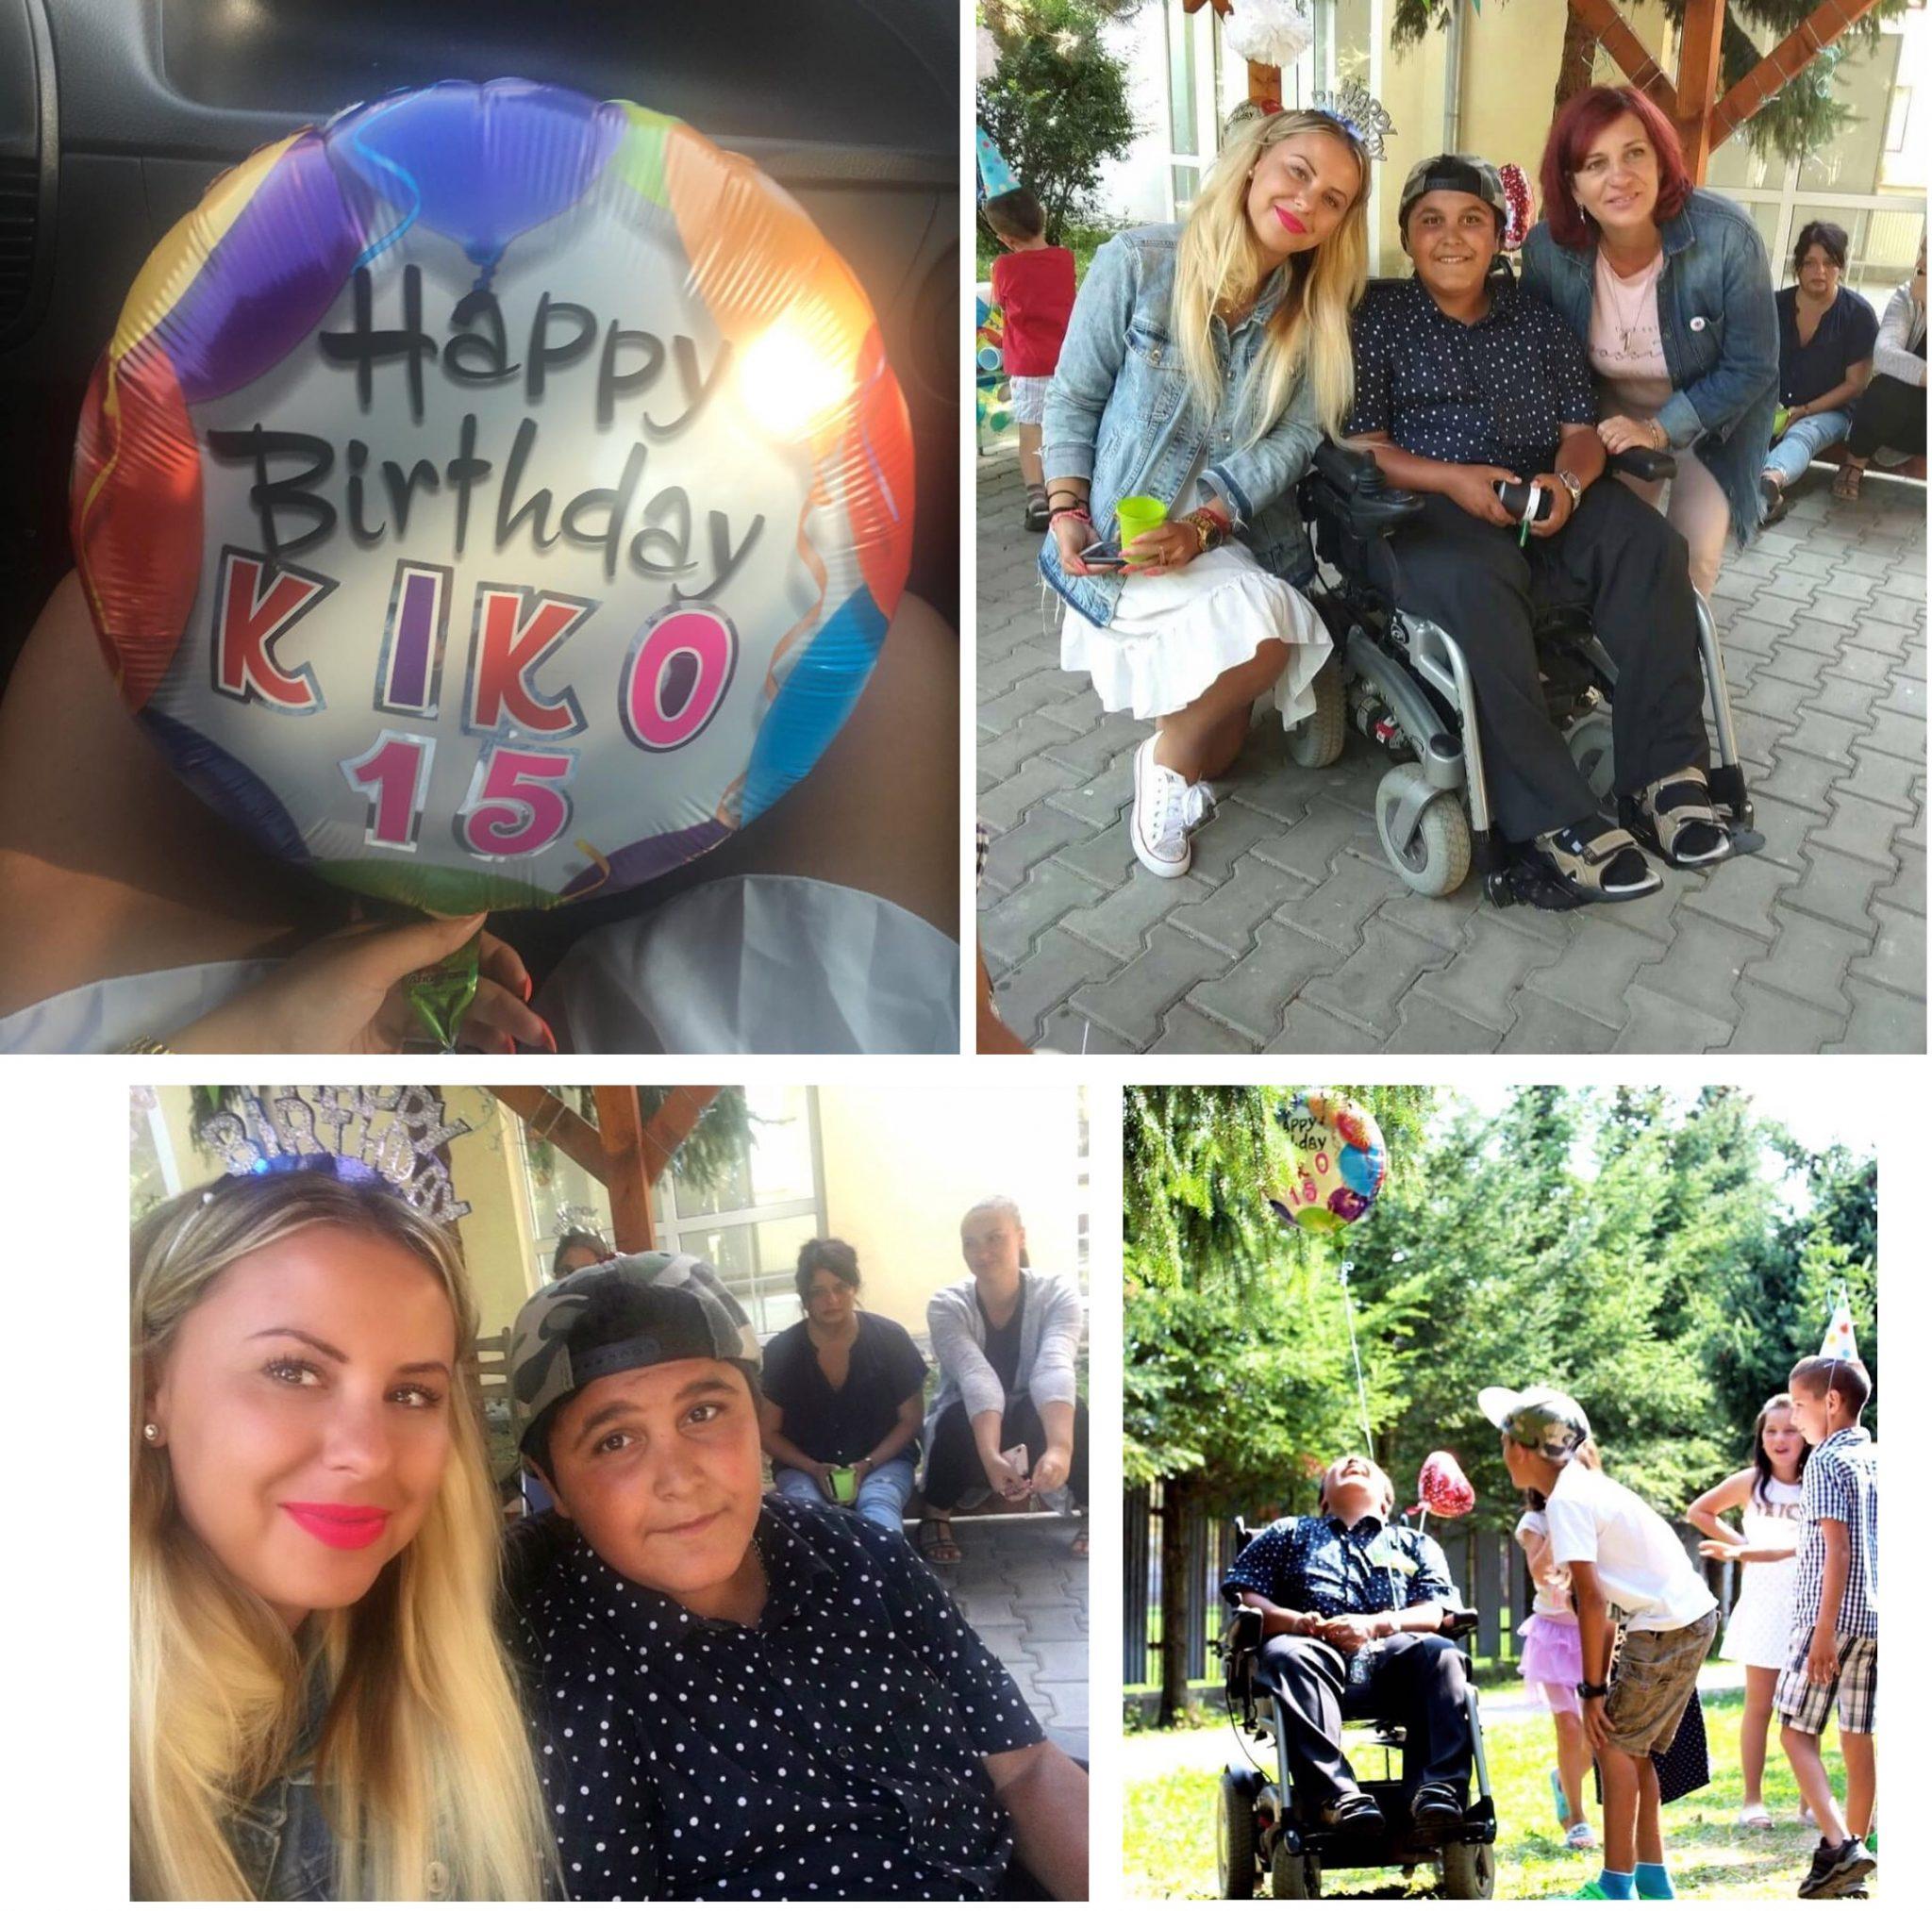 narodeniny_kiko (6)